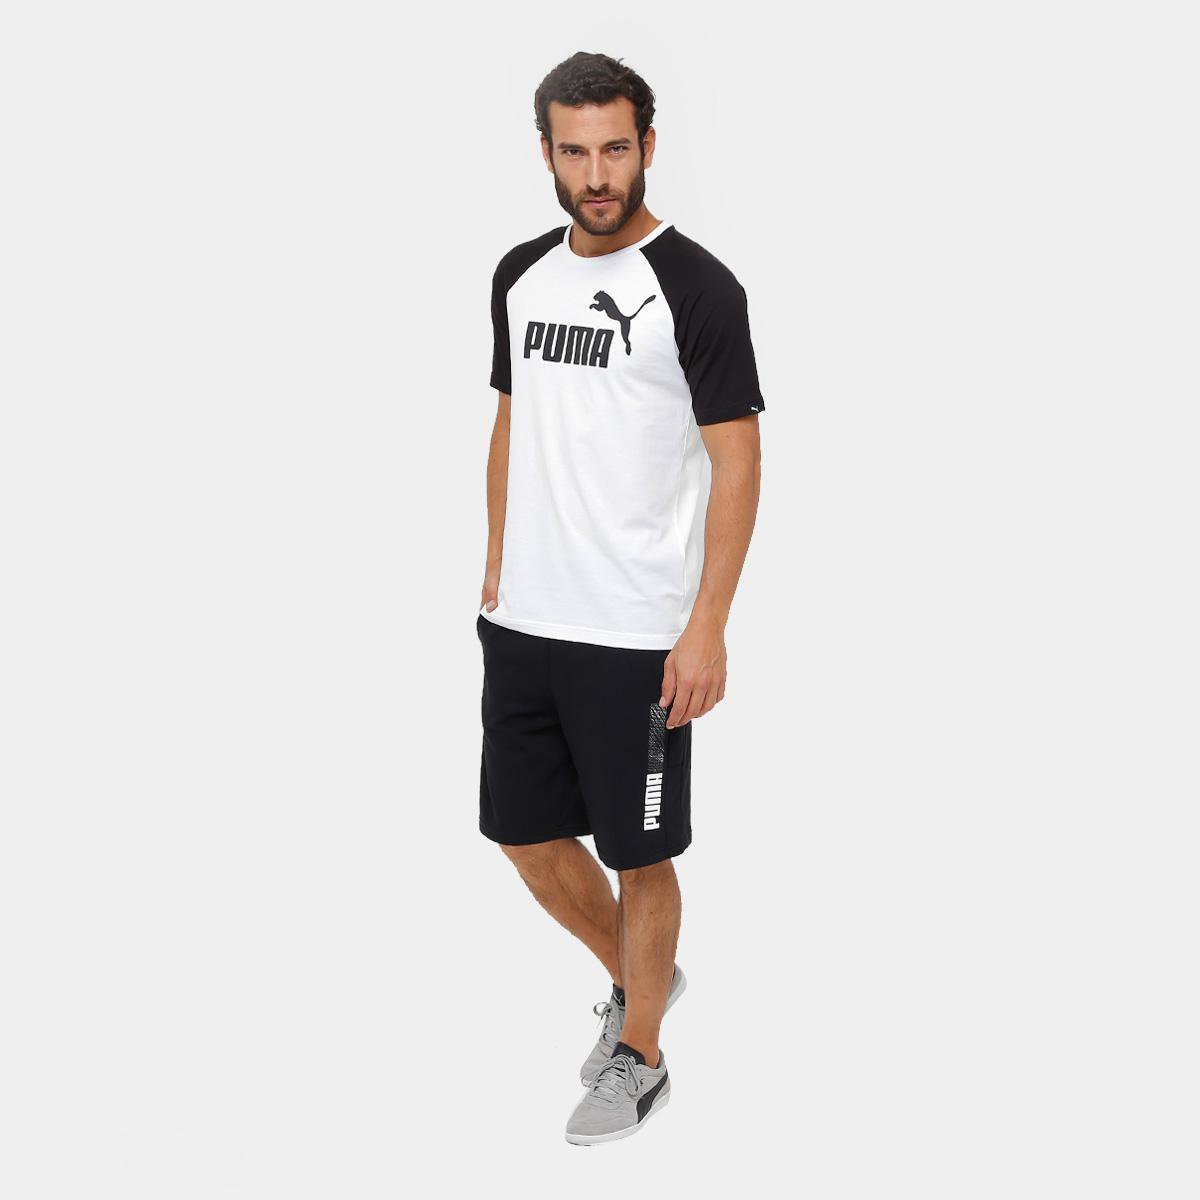 69d999a43a Camiseta Puma No.1 Logo Raglan Masculina - Branco - Compre Agora ...